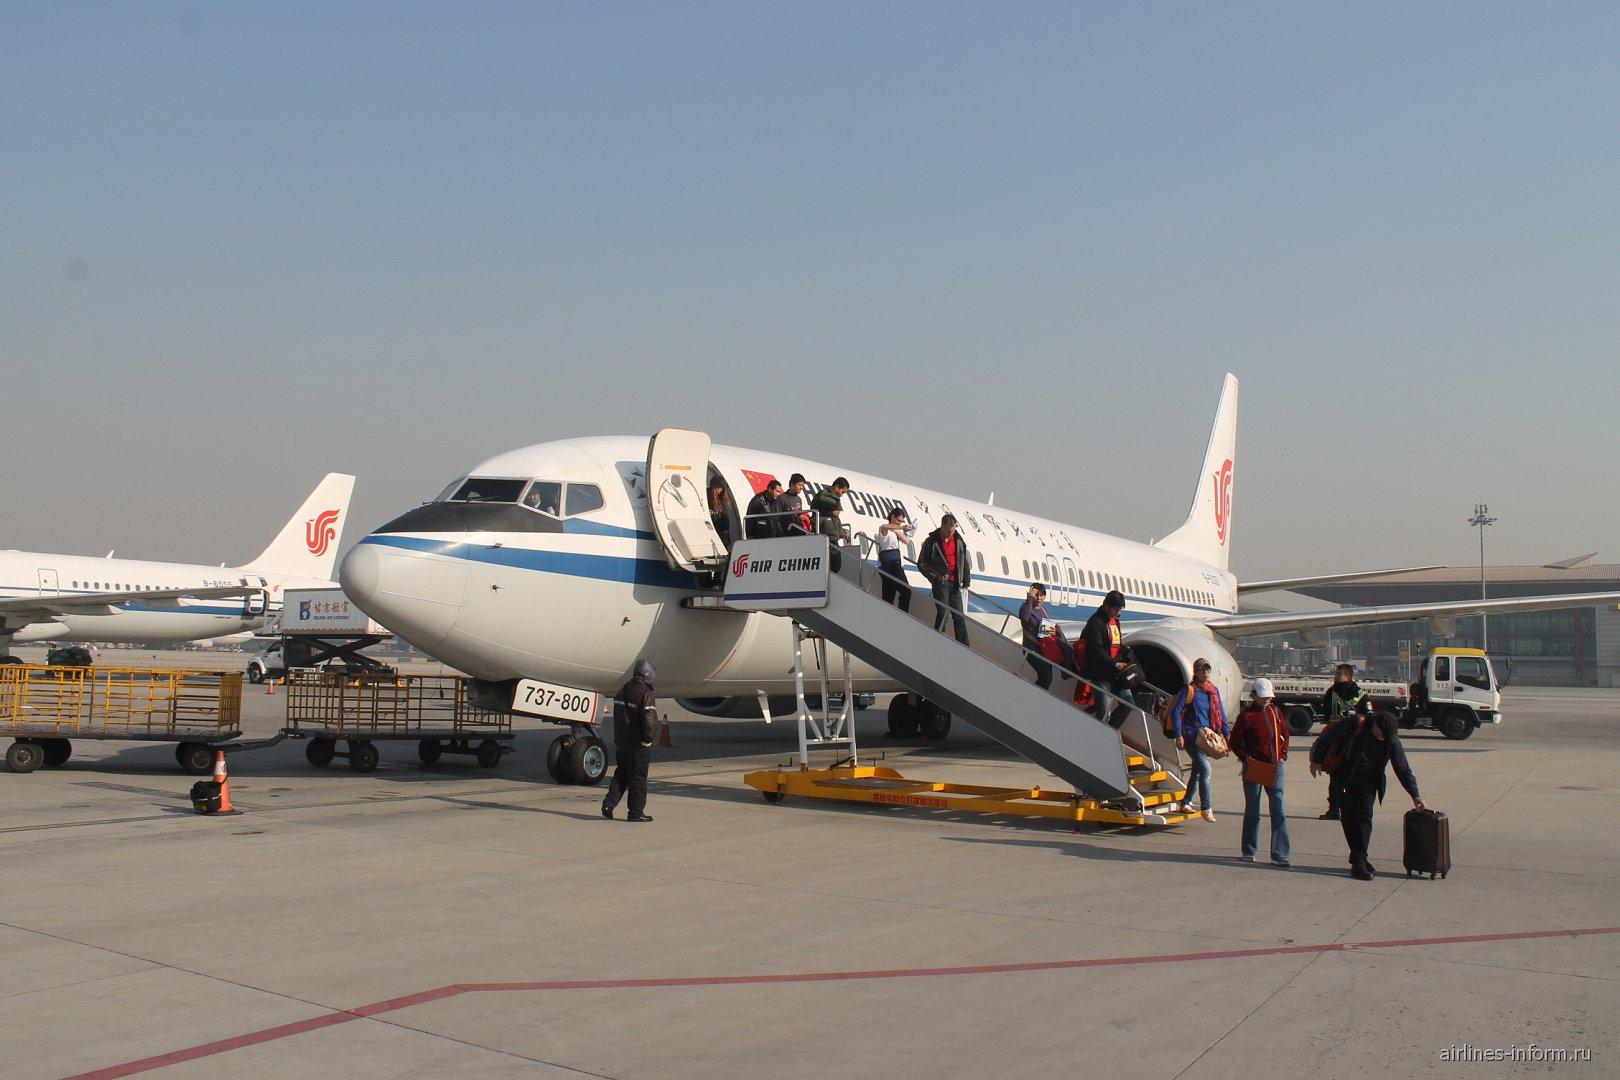 Боинг-737-800 авиакомпании Air China в аэропорту Пекина